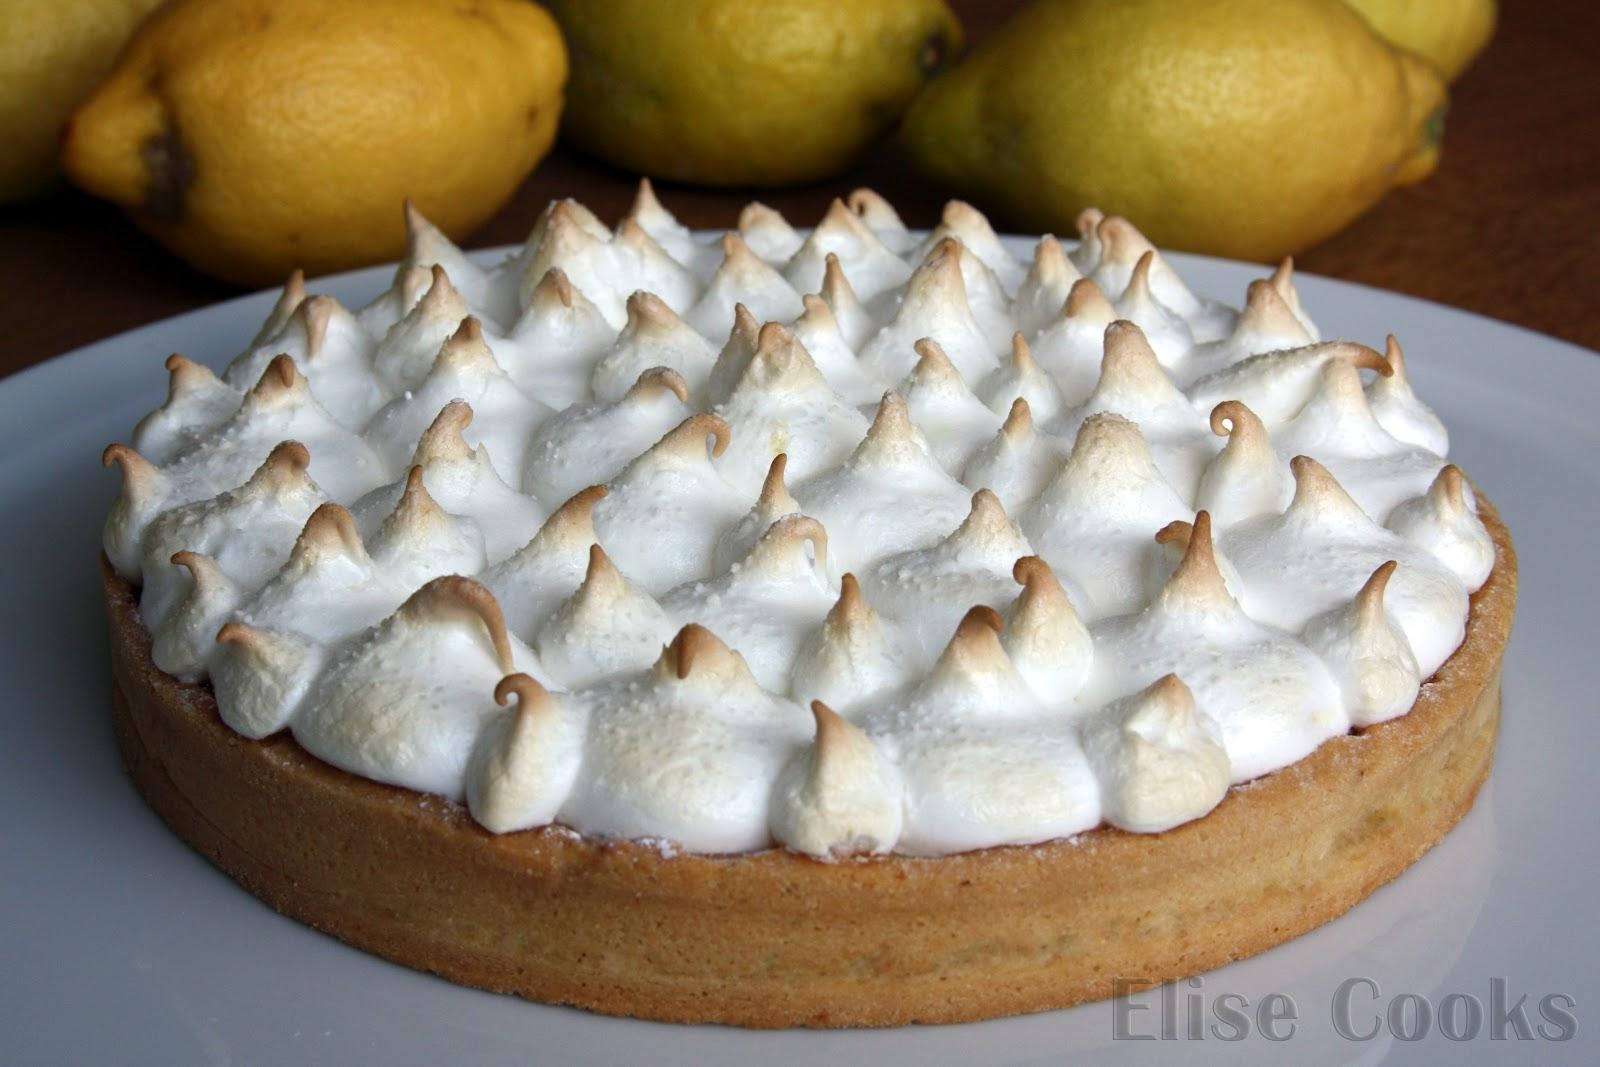 Tarte Au Citron Meringuee Facon Pierre Herme Elise Cooks